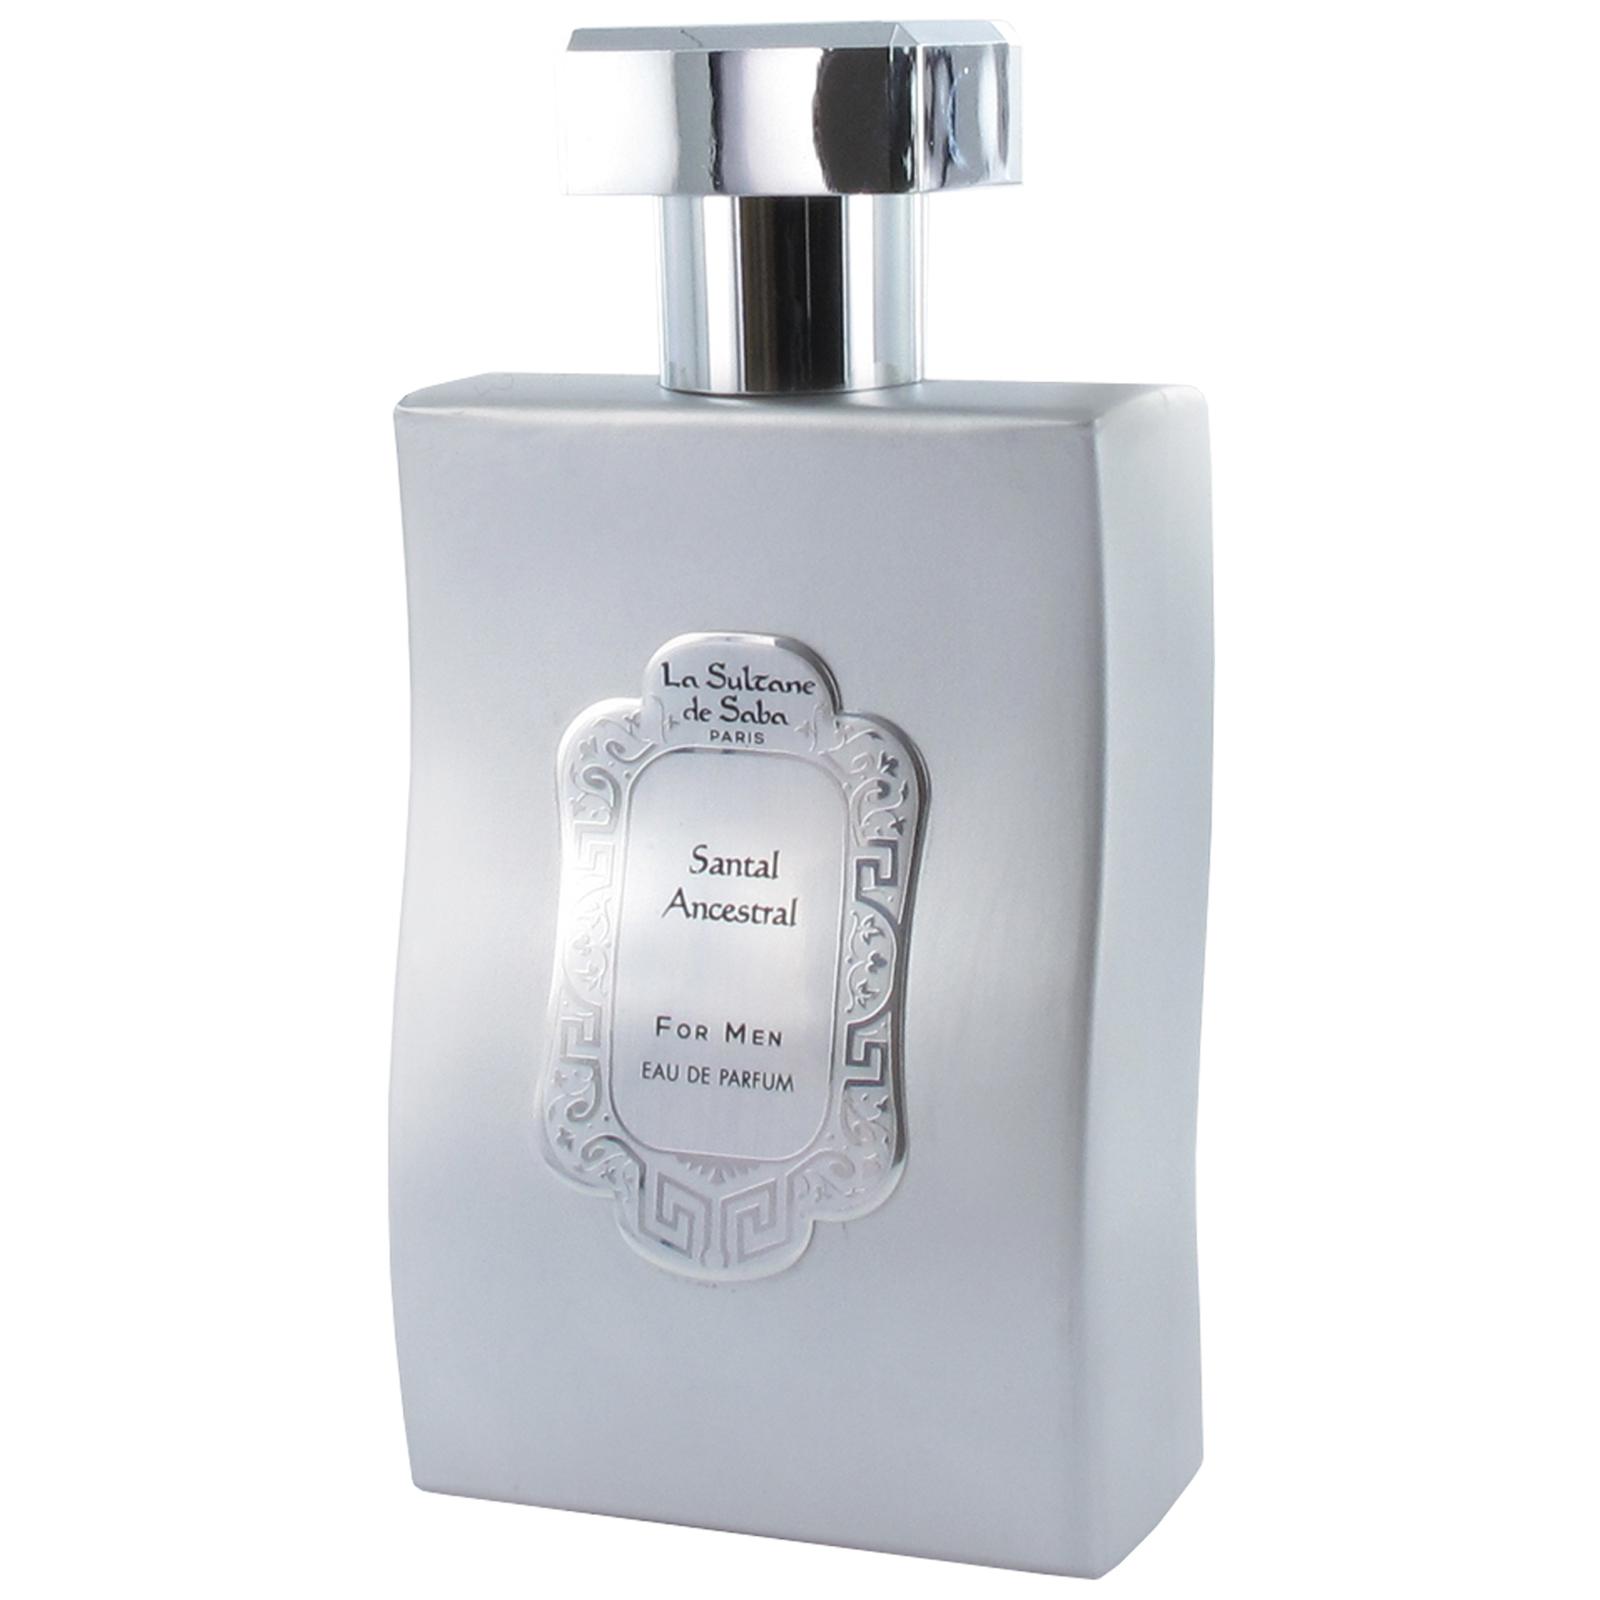 Santal ancestral profumo eau de parfum 100 ml